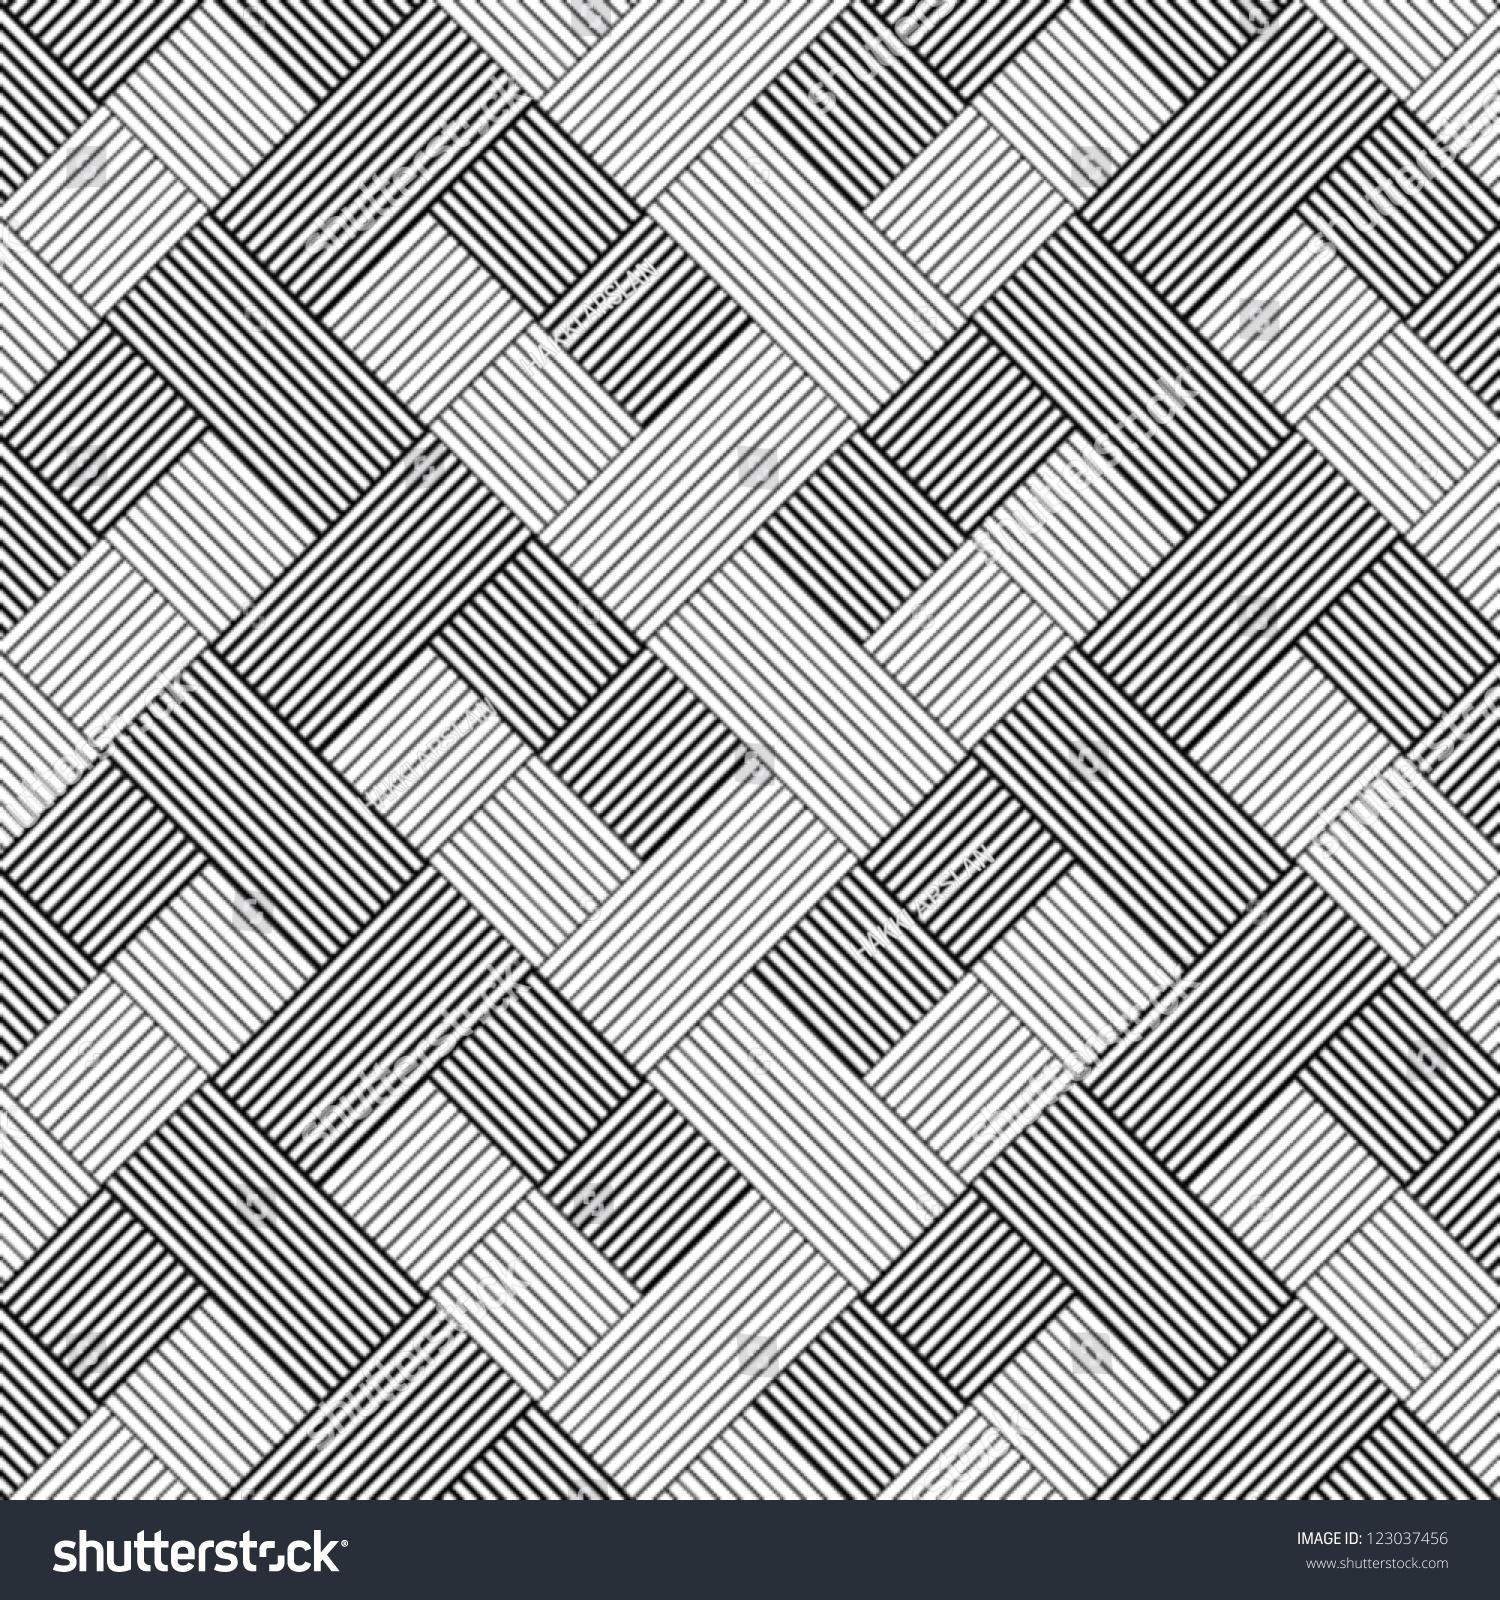 Line Art Texture : Line art geometric pattern texture background stock vector